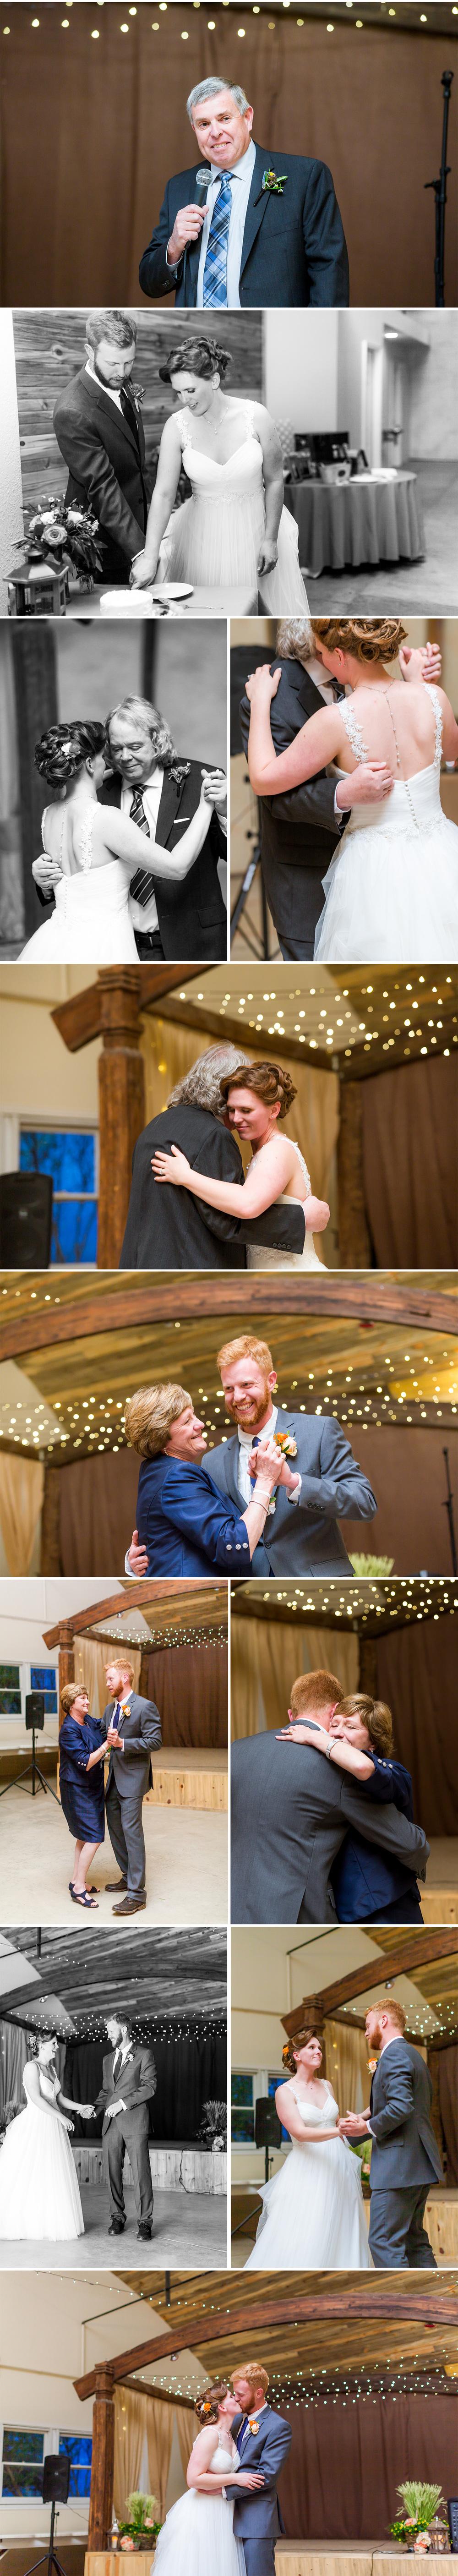 12 Fort Collins Wedding Photographer.jpg